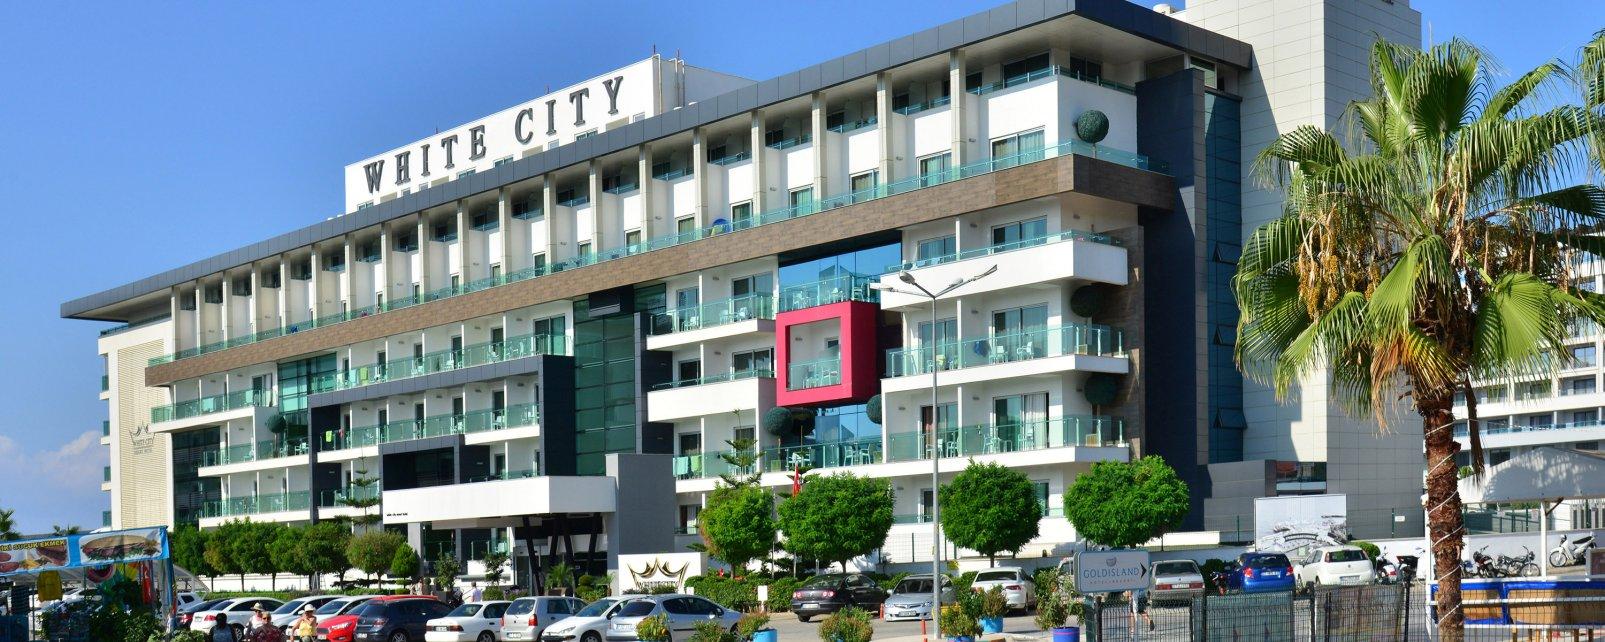 Hôtel White City Resort